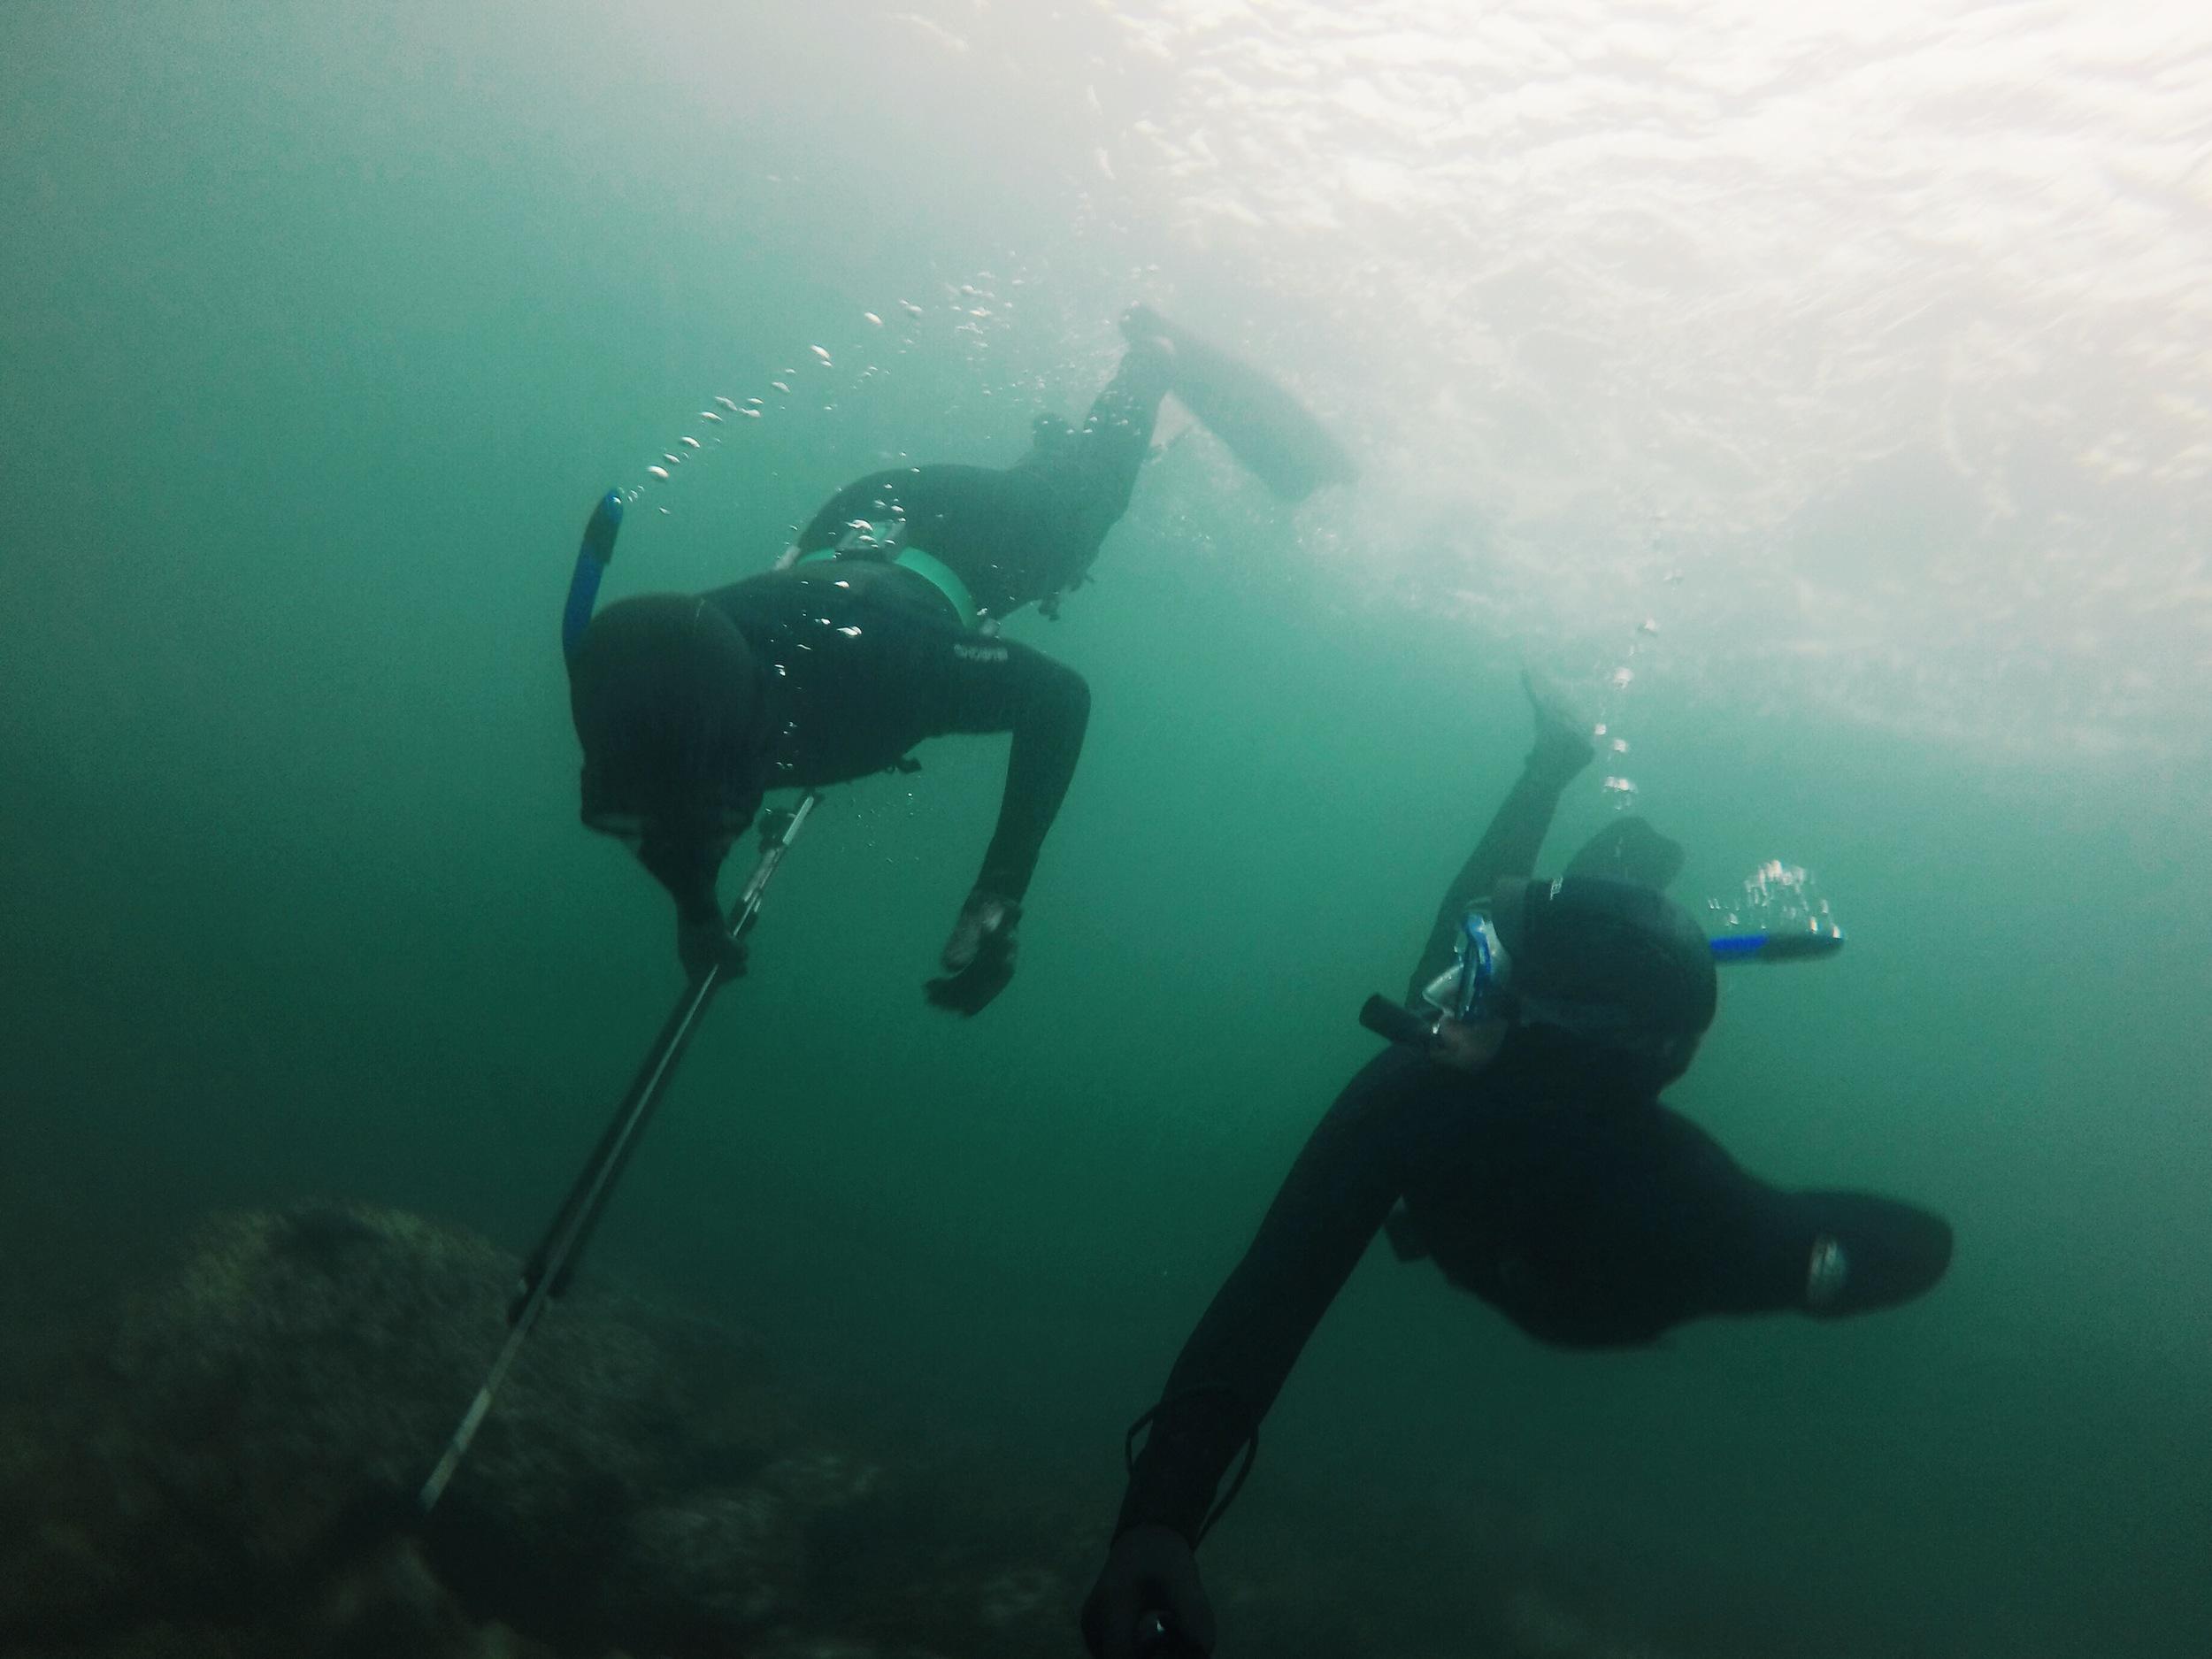 Spearfishing Amelia Wachtin